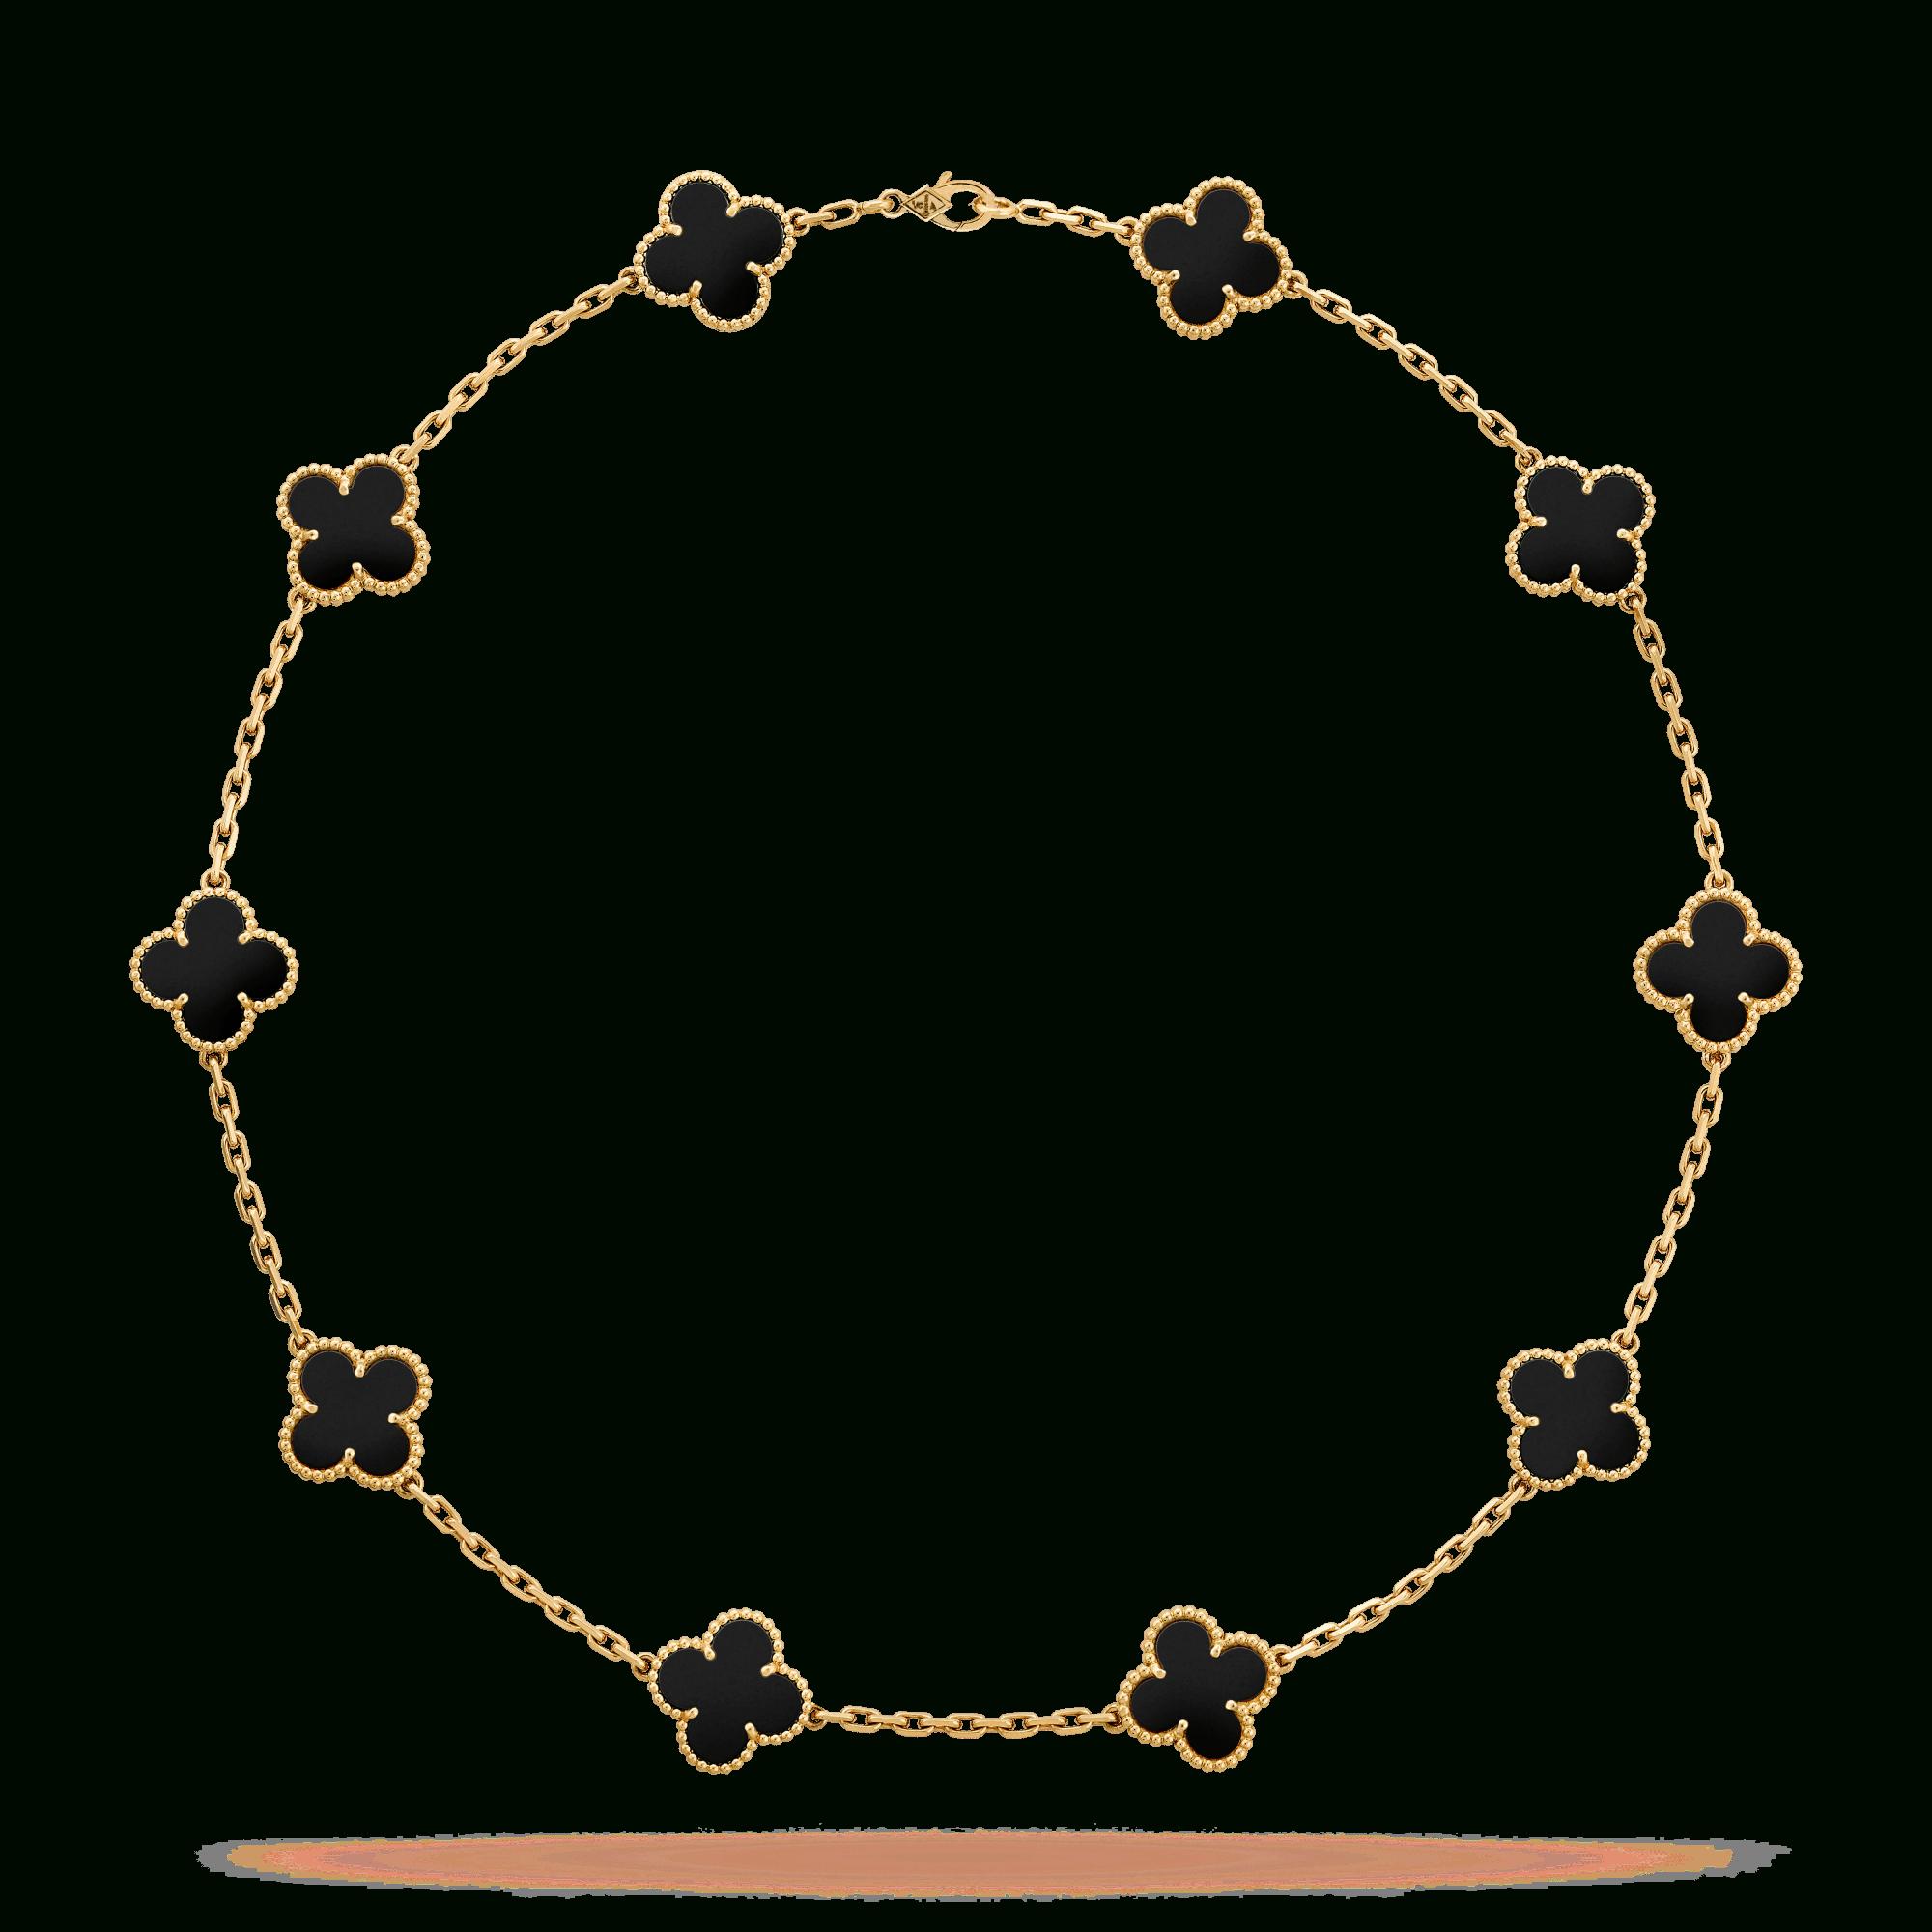 Vintage Alhambra Necklace, 10 Motifs – Vcara42700  Van Cleef & Arpels Intended For Recent Vintage Circle Collier Necklaces (Gallery 13 of 25)